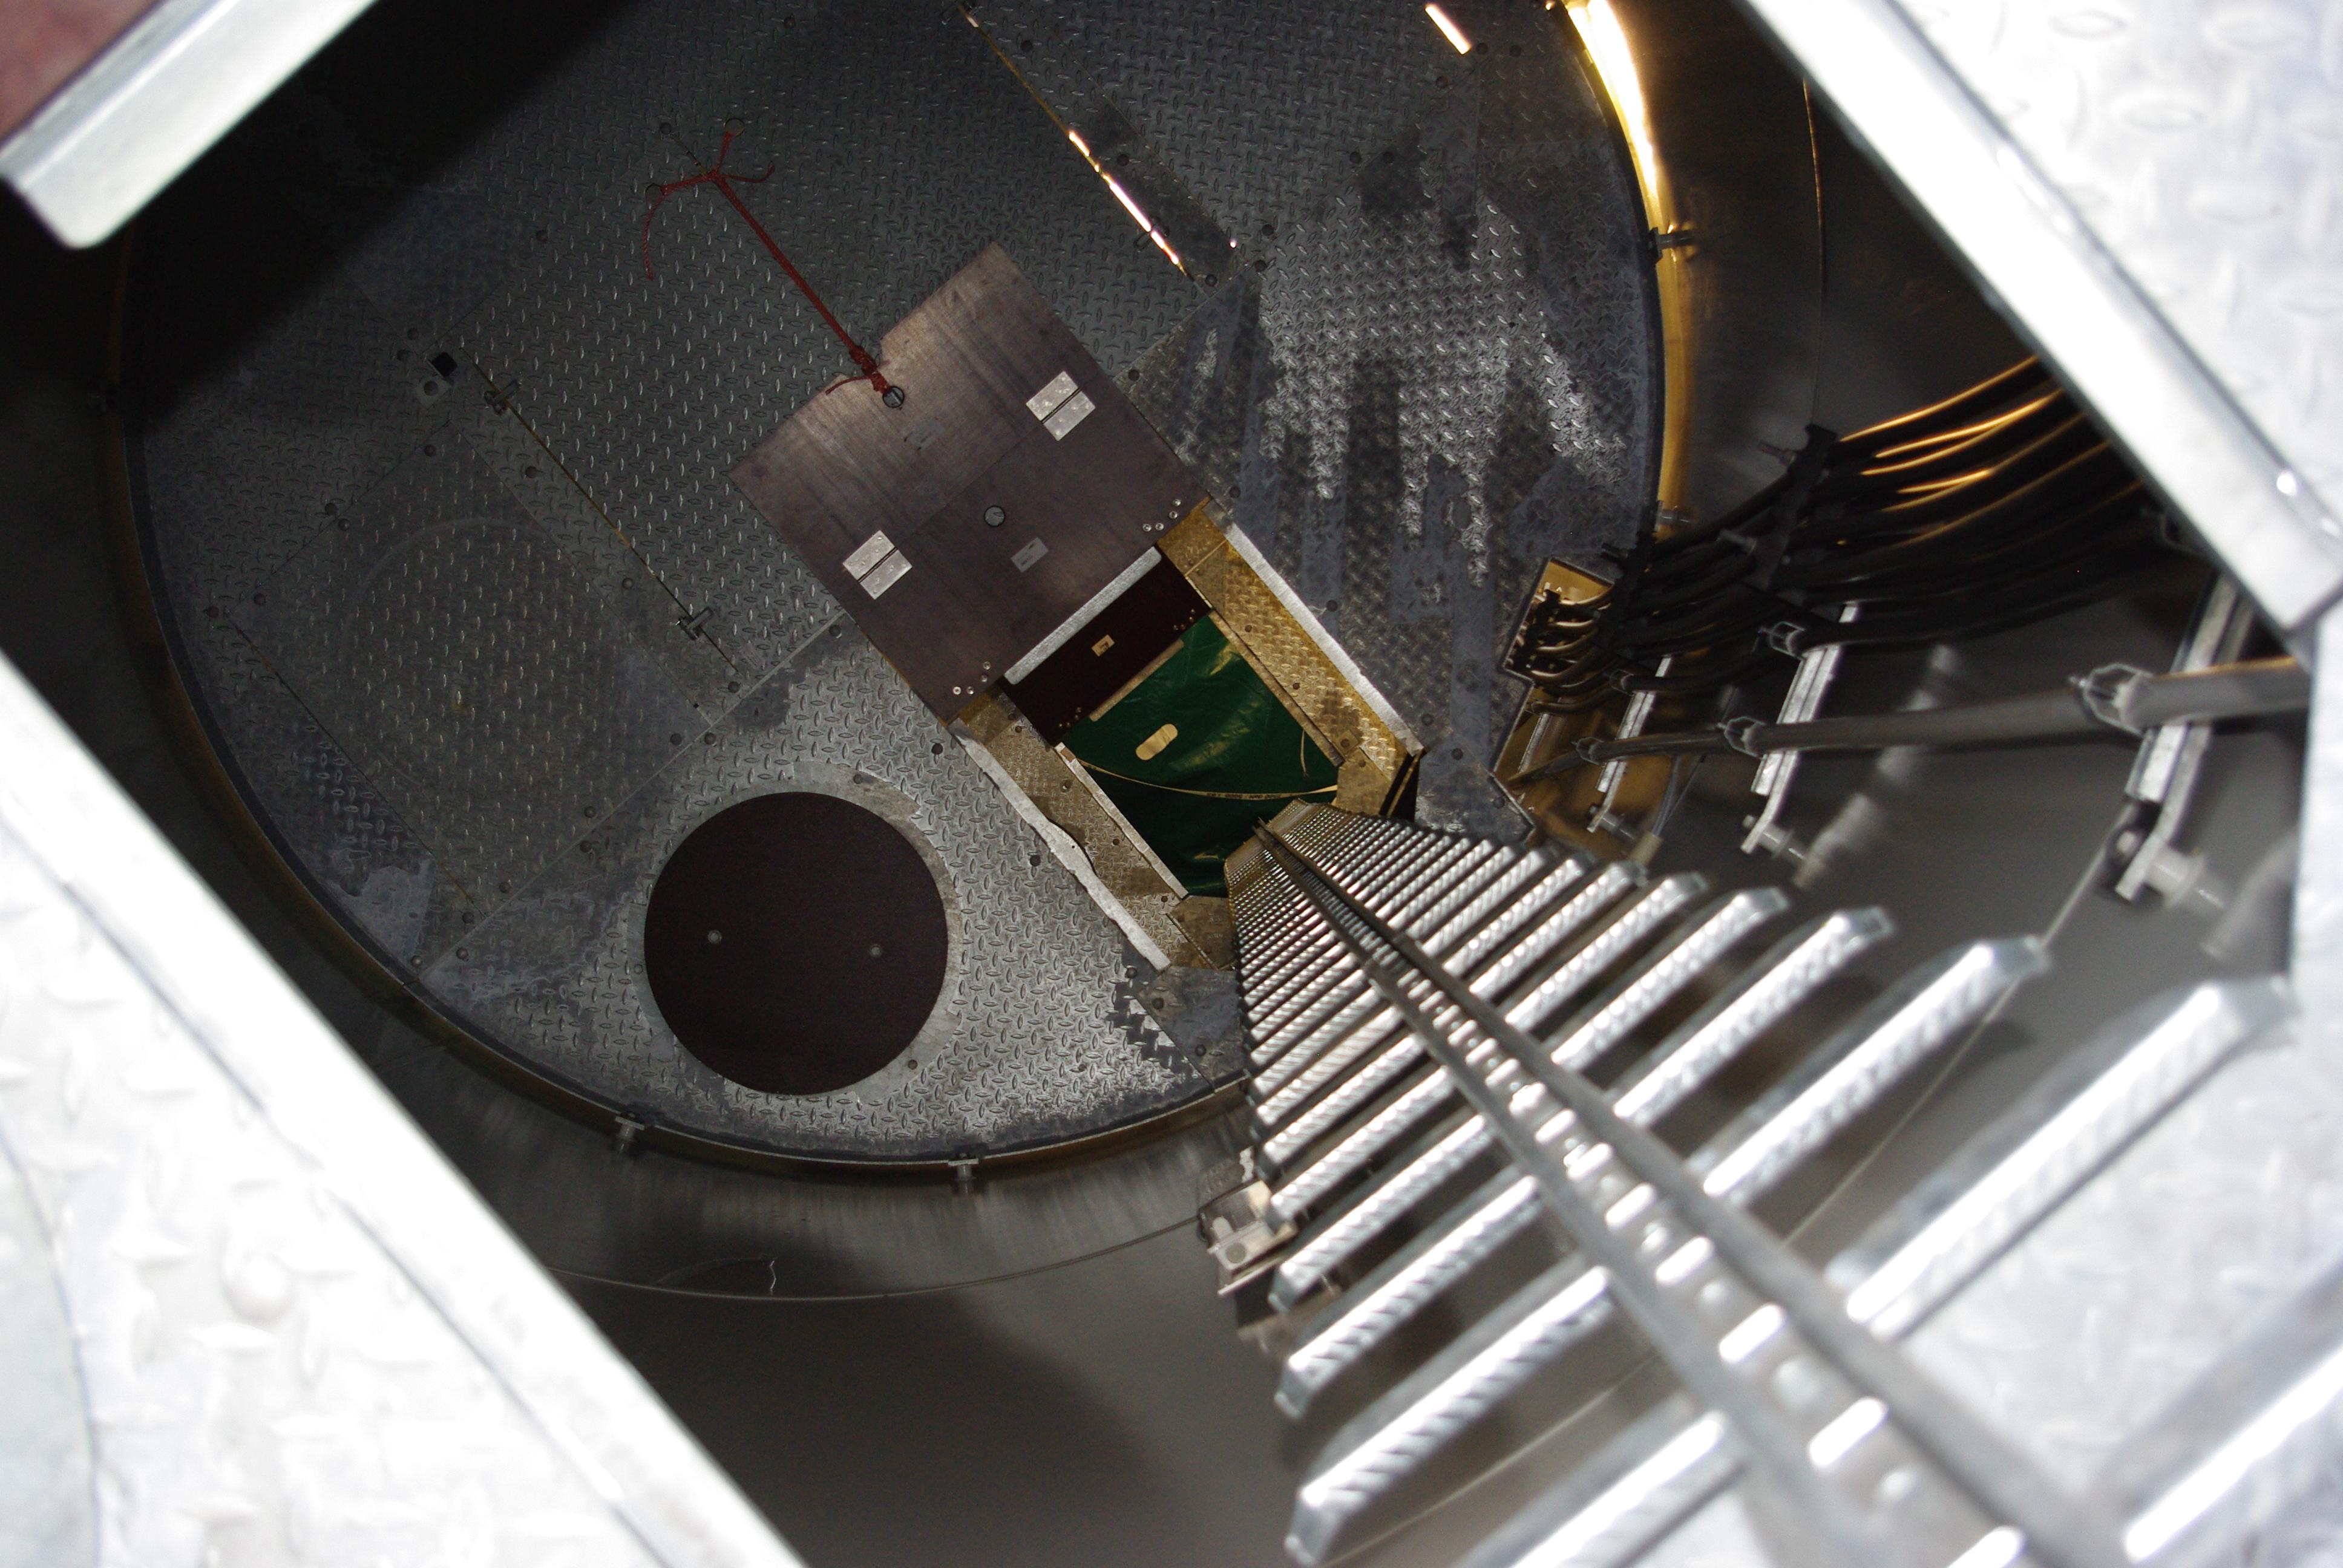 Inside the Turbine